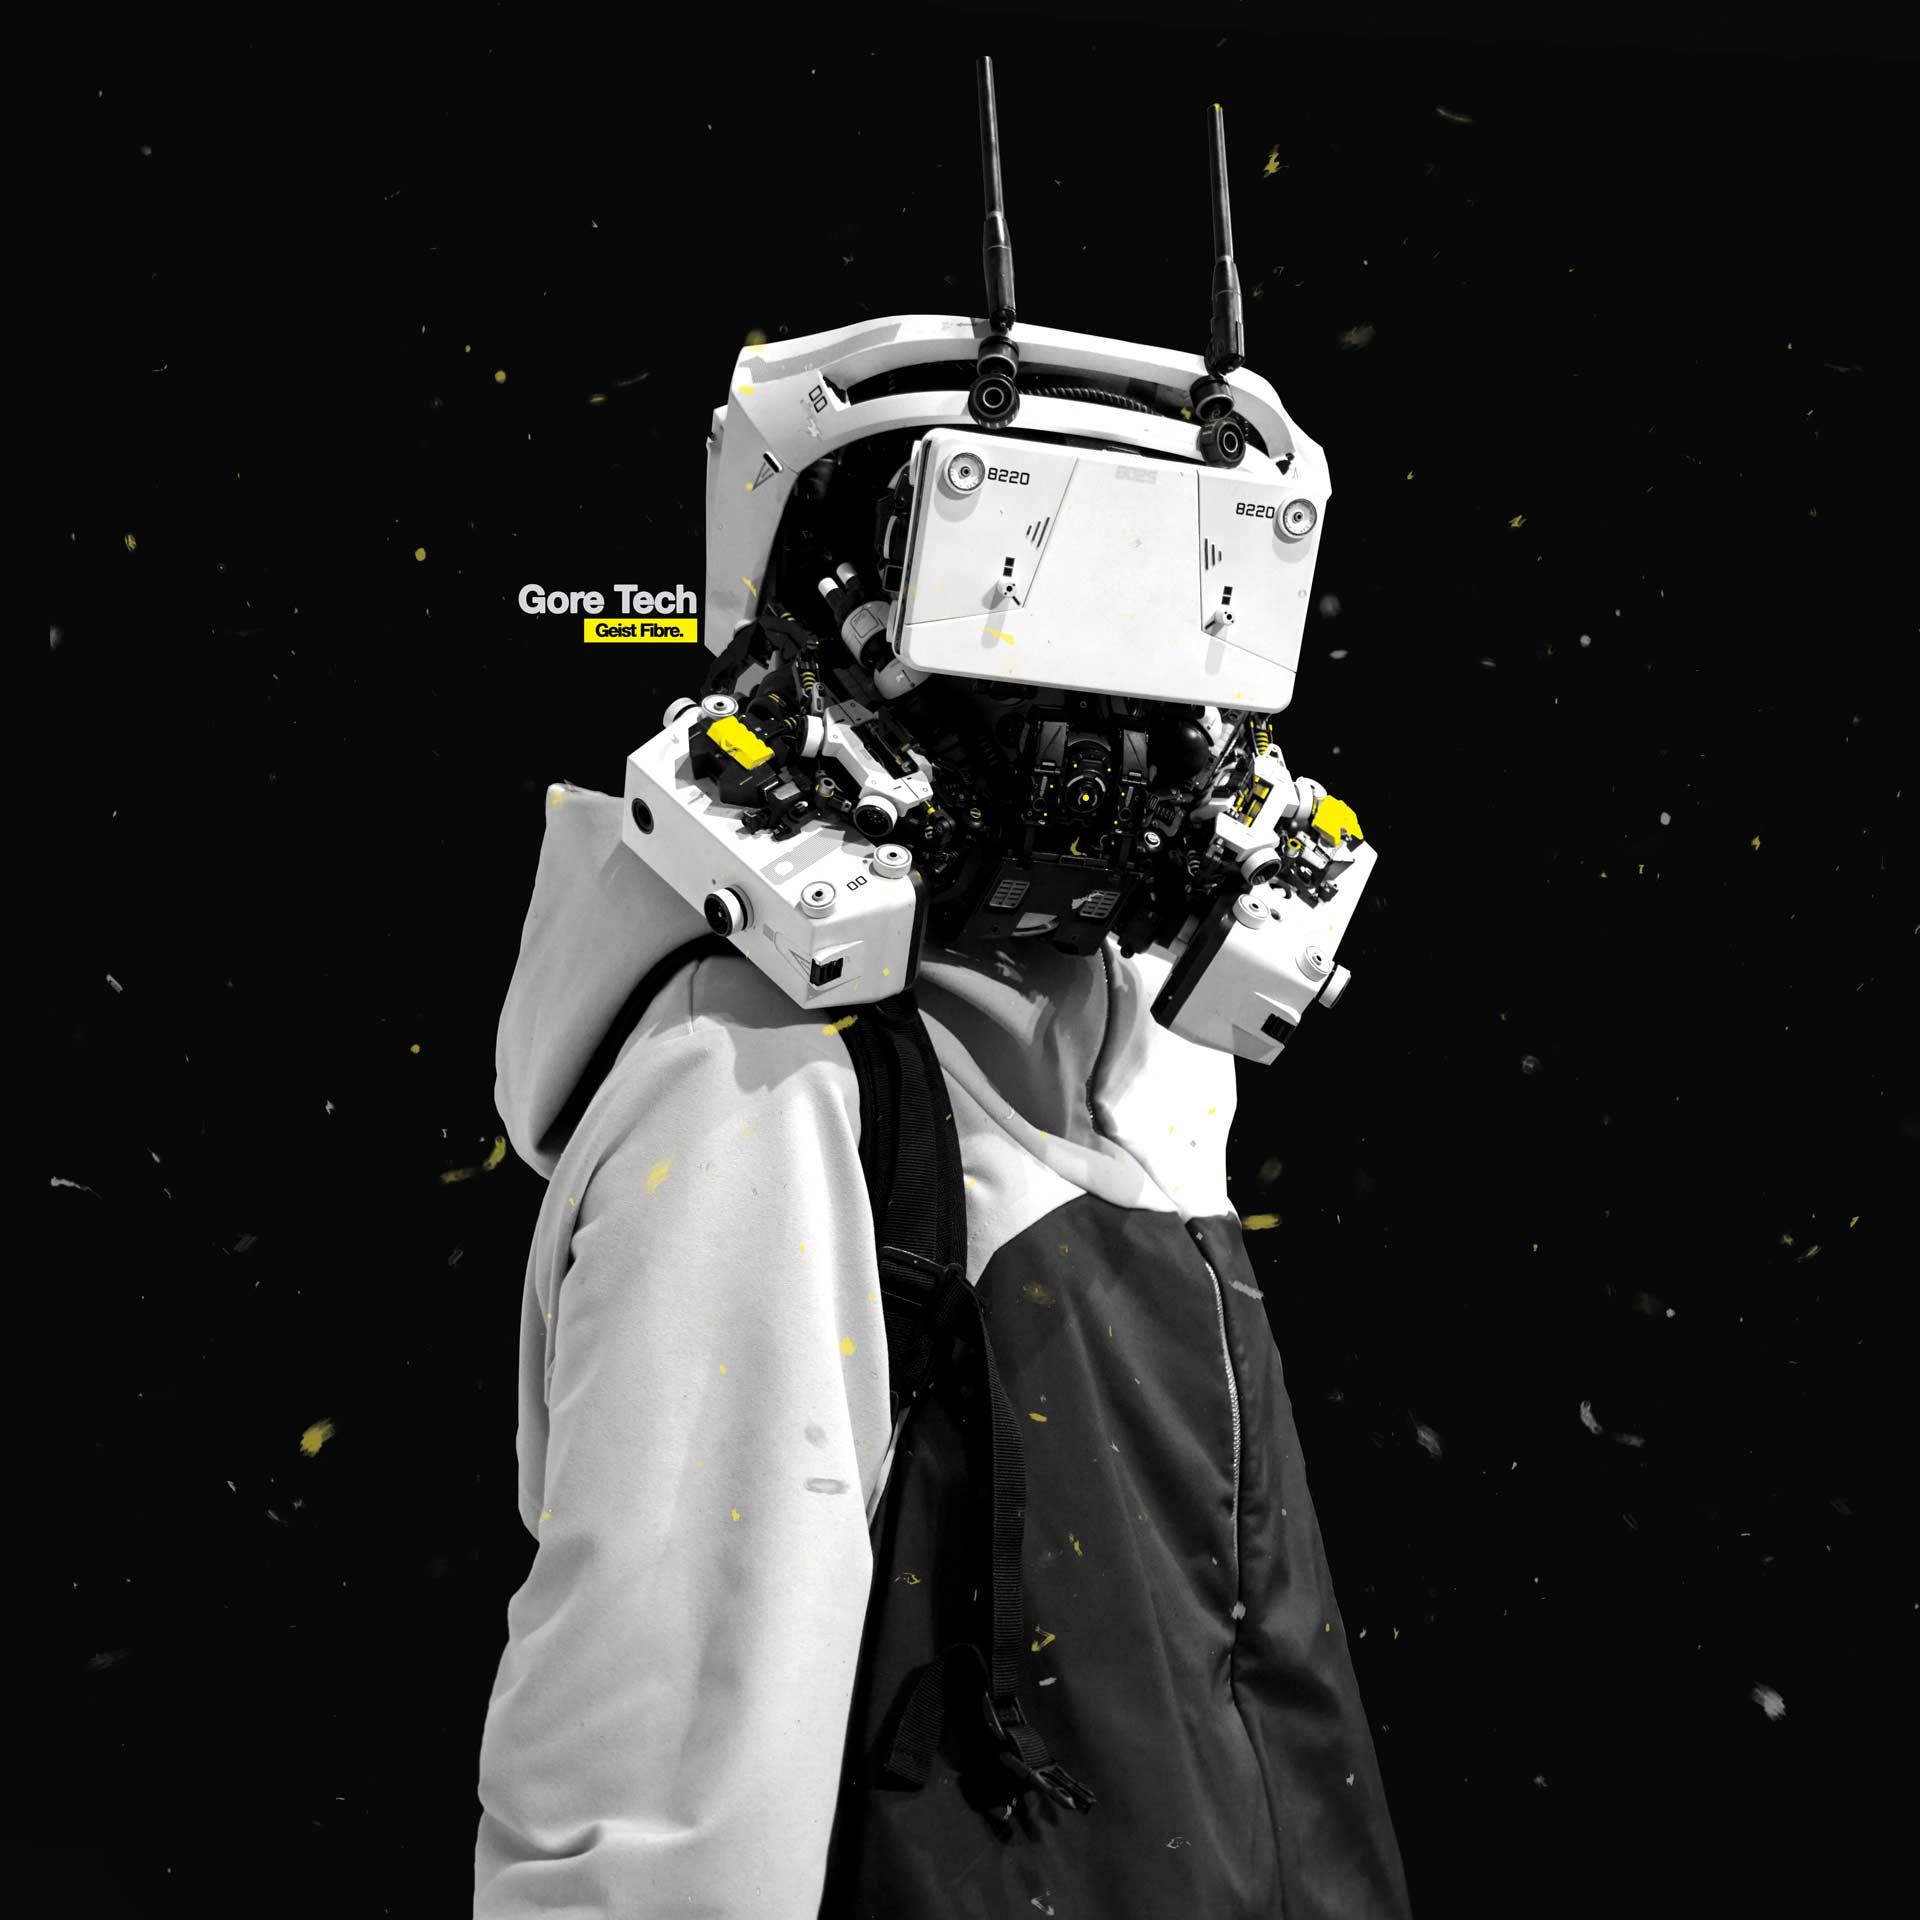 Umut präsentiert: Gore Tech – Geist Fibre LP [49MOHM]